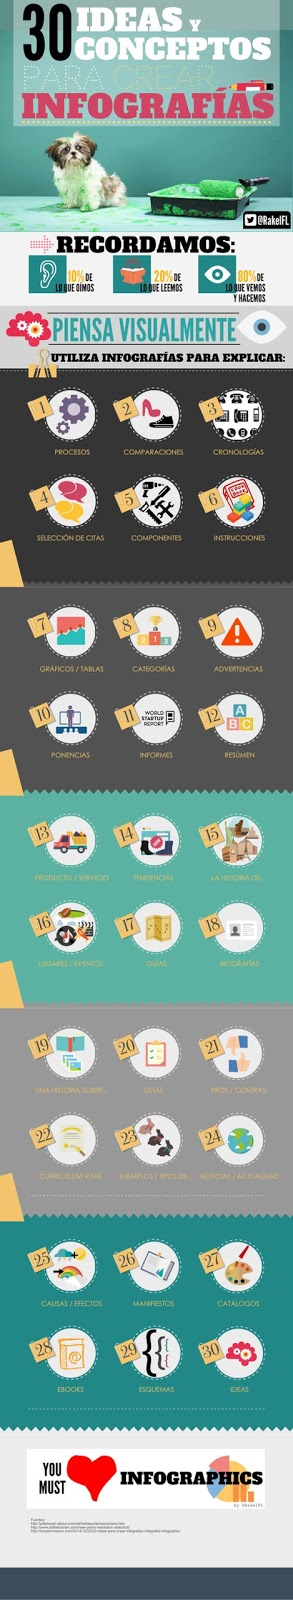 30 ideas y conceptos para crear infografías